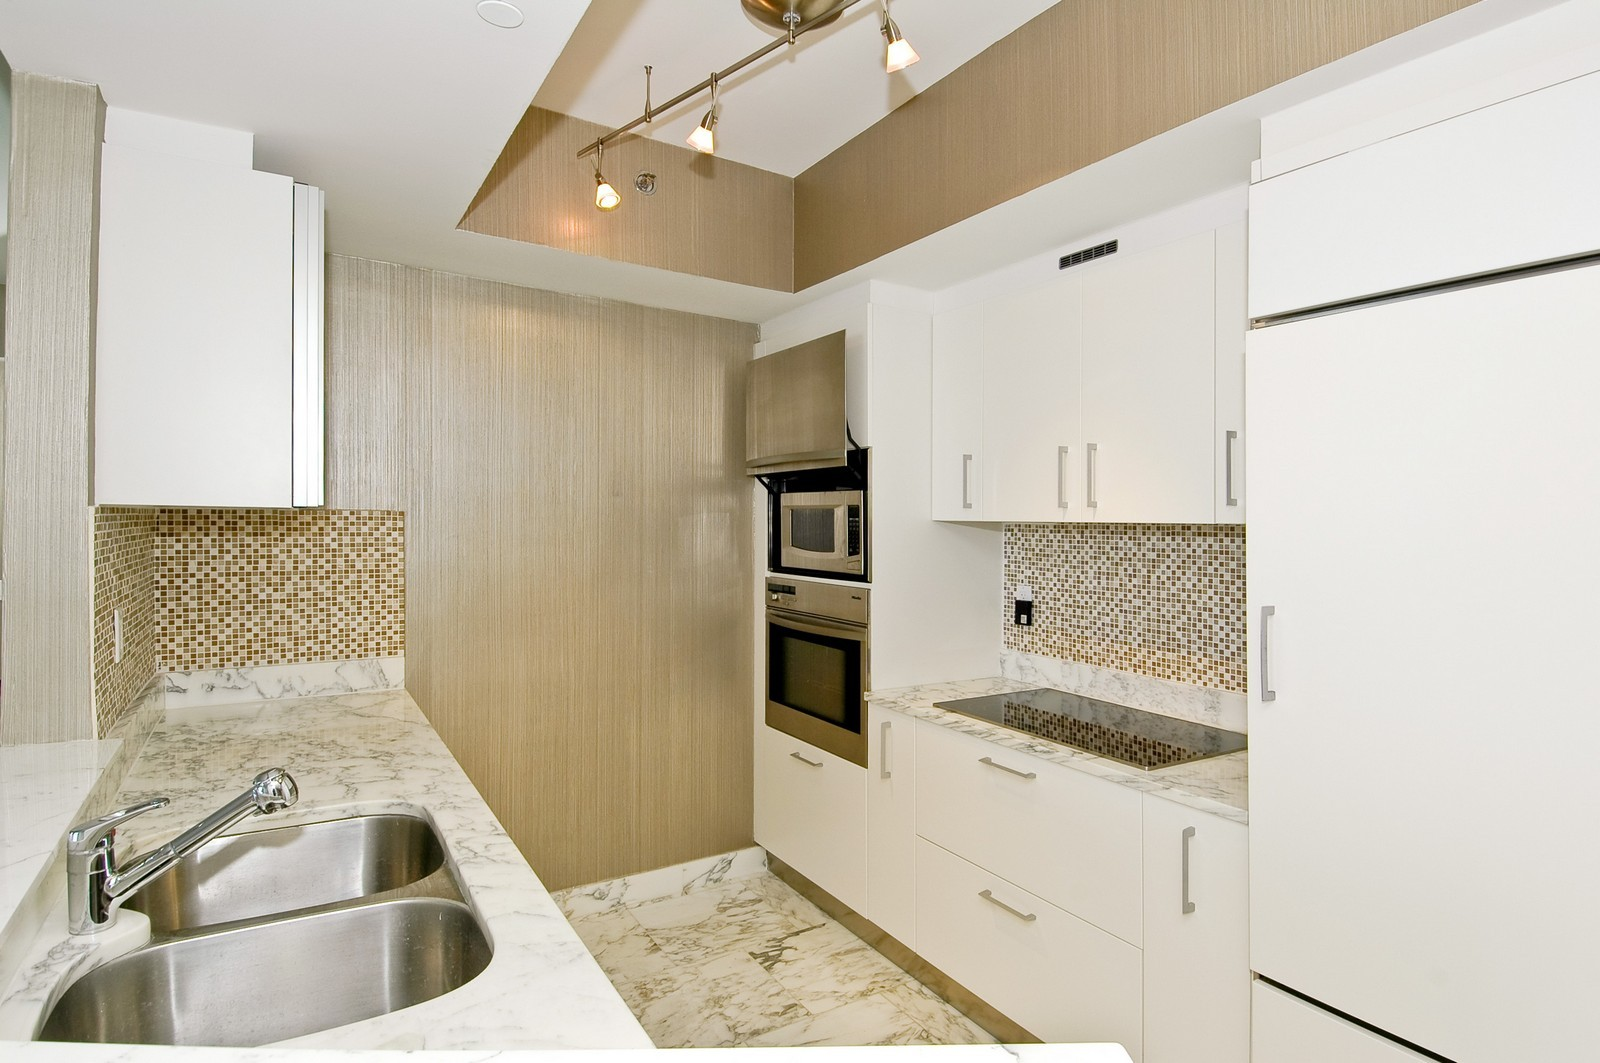 Real Estate Photography - 450 Alton Rd, Unit 2910, Miami Beach, FL, 33139 - Kitchen